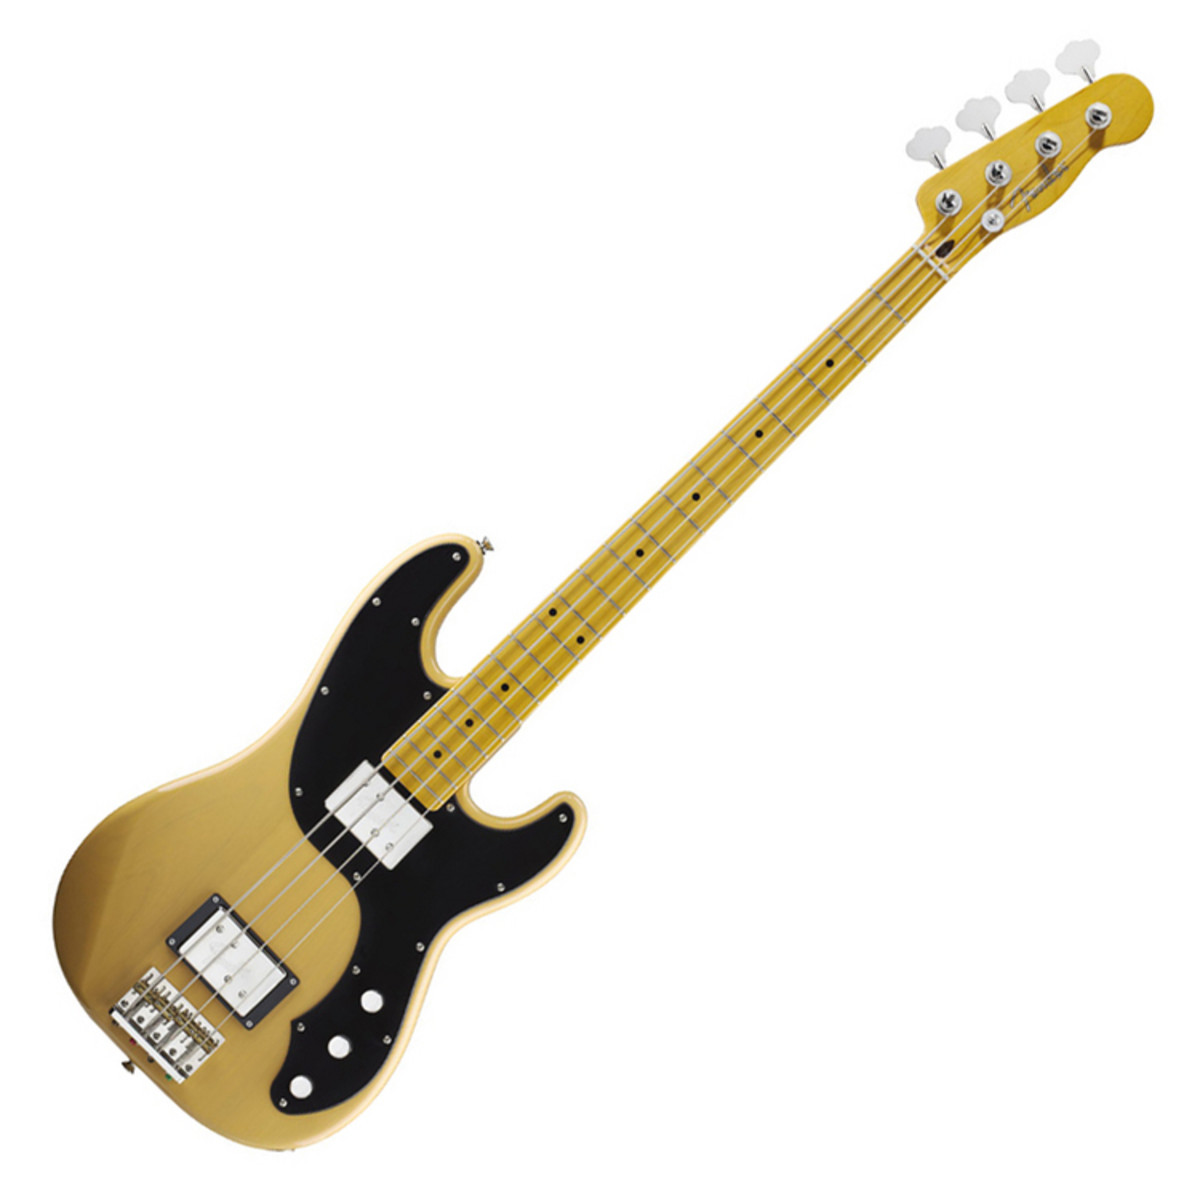 fender modern player telecaster bass mn butterscotch blonde at gear4music. Black Bedroom Furniture Sets. Home Design Ideas